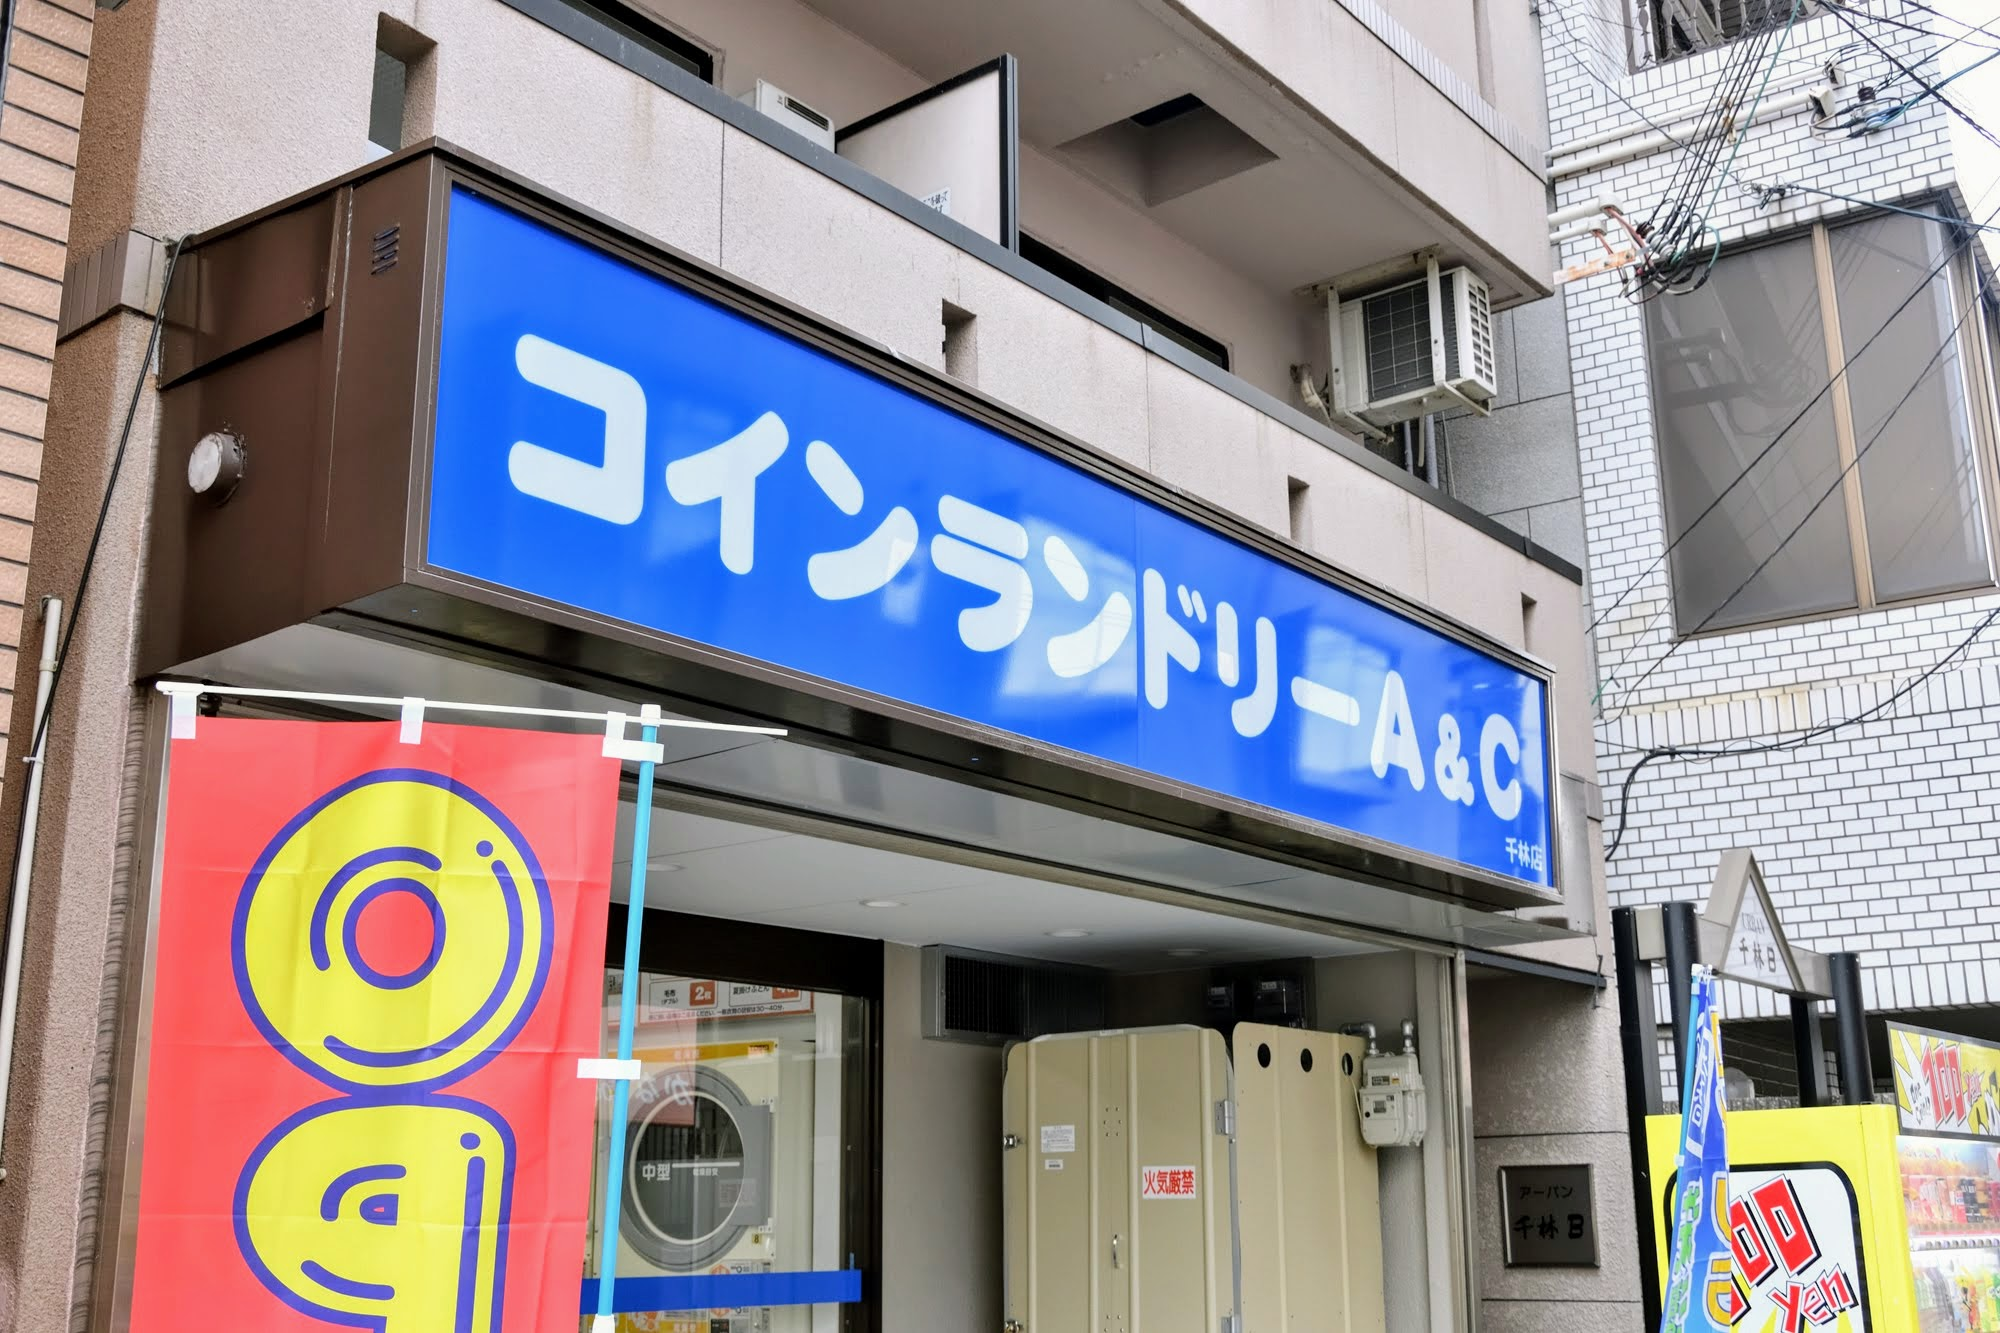 COIN LAUNDRY A&C - senbayashi 画像6